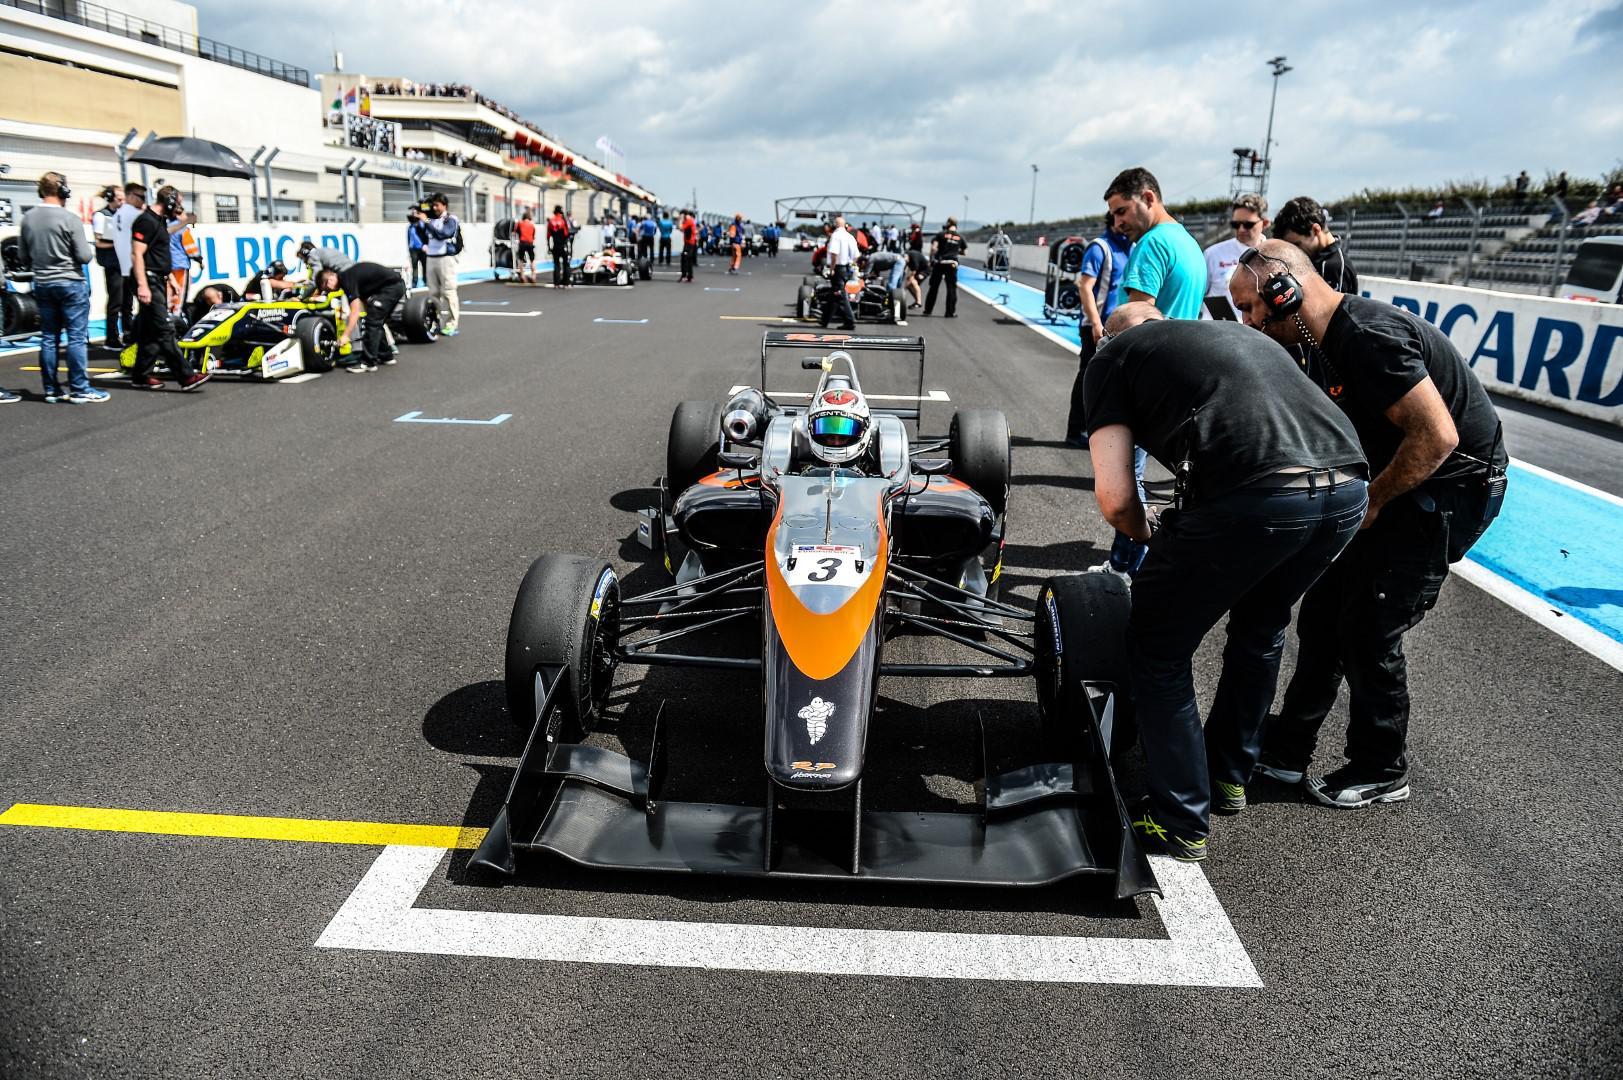 benyahia-un-premier-podium-en-formule-3-778-1.jpg